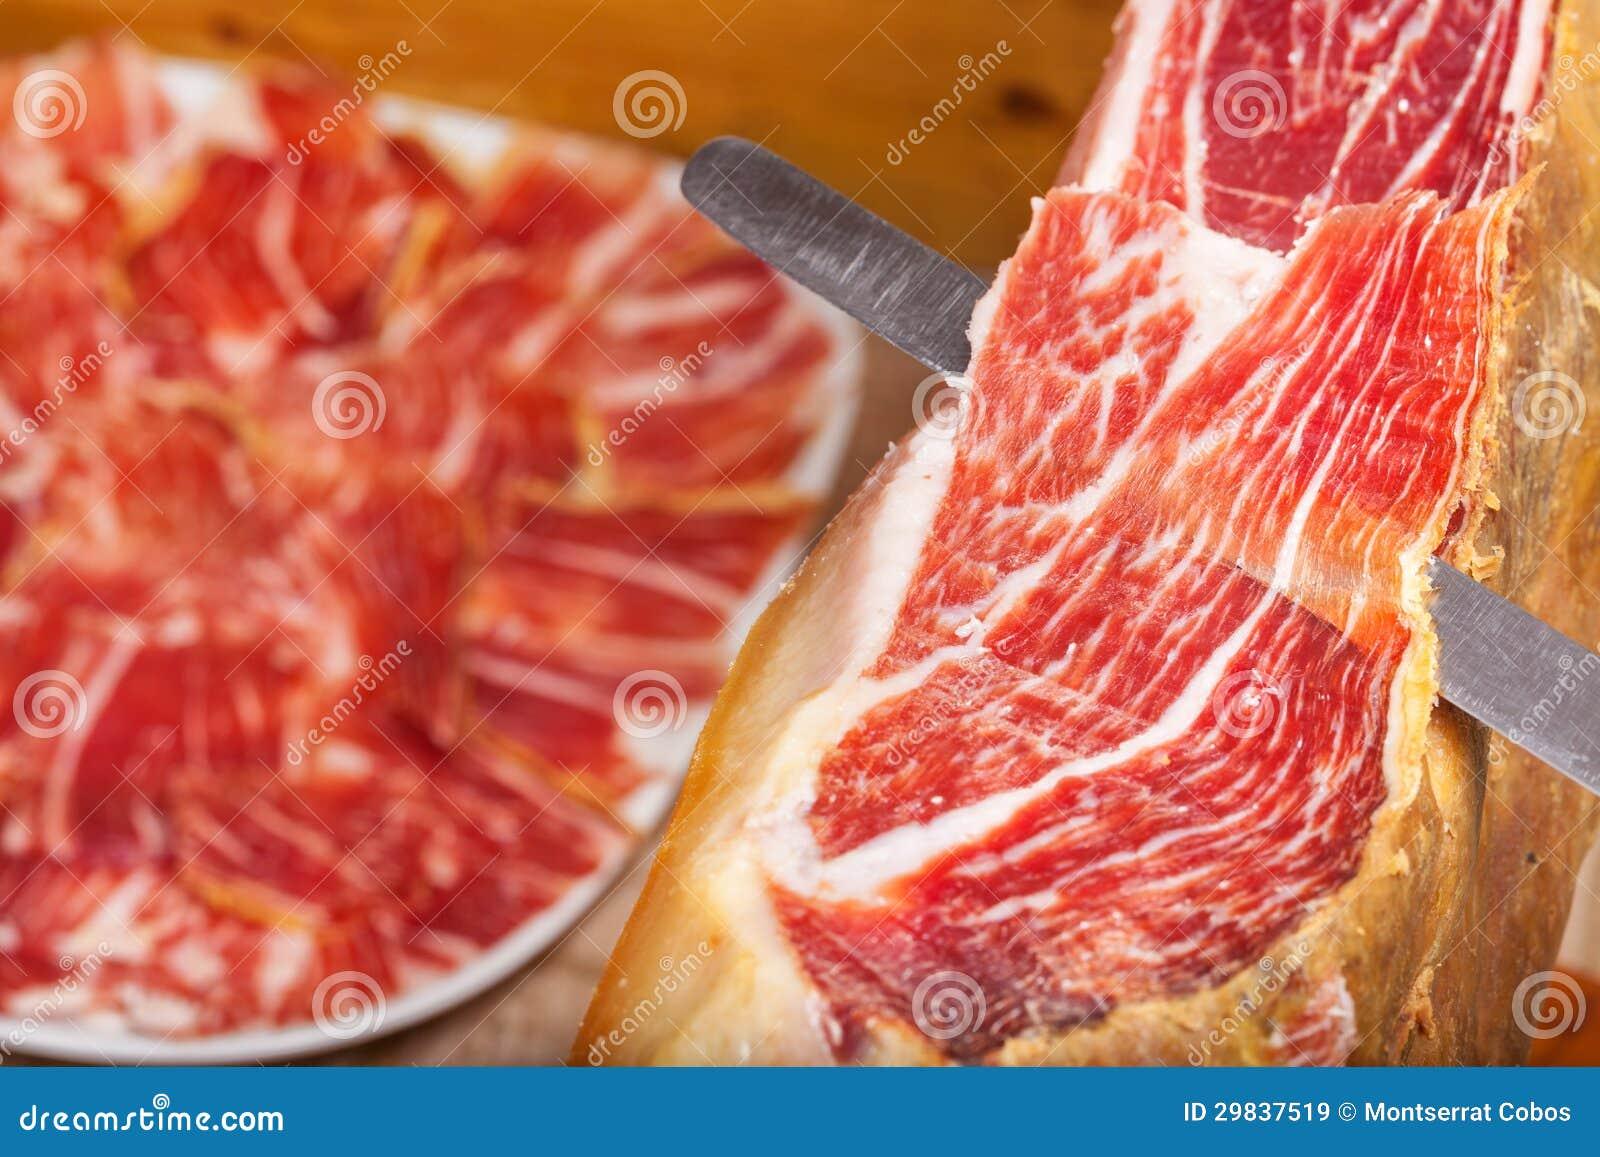 Cortando o iberico espanhol do jamon